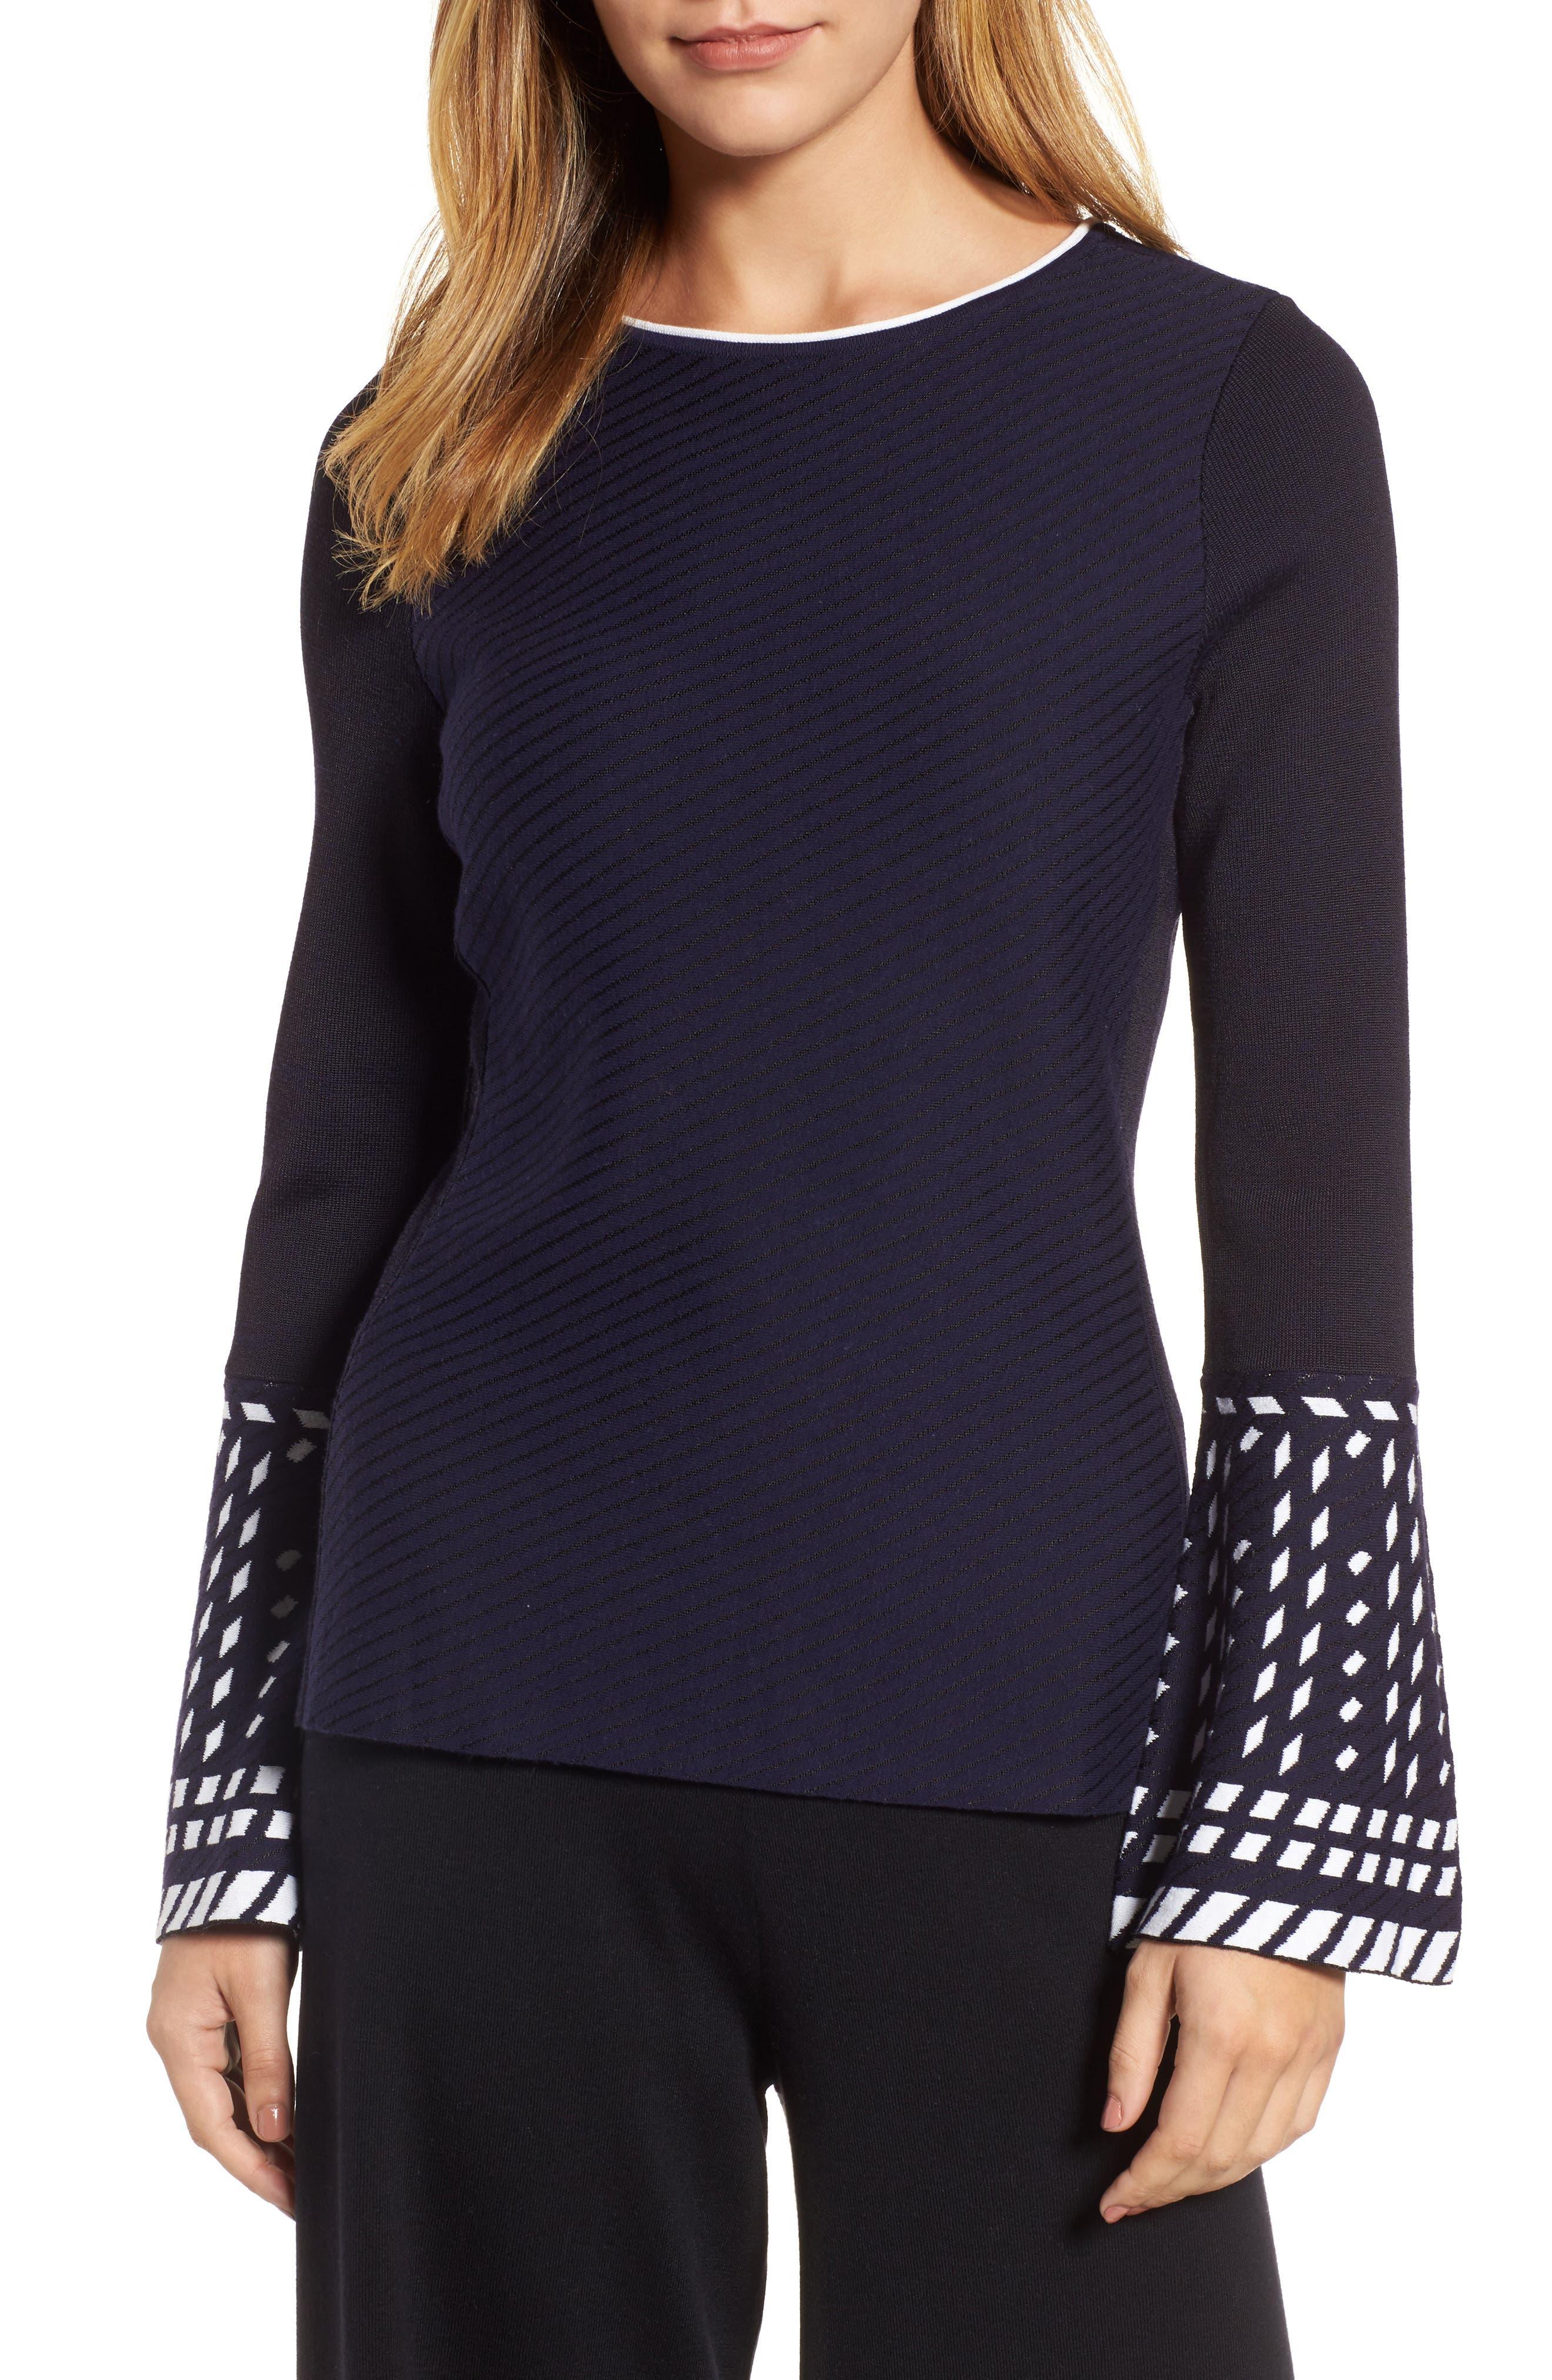 Falling Star Sweater,                         Main,                         color,